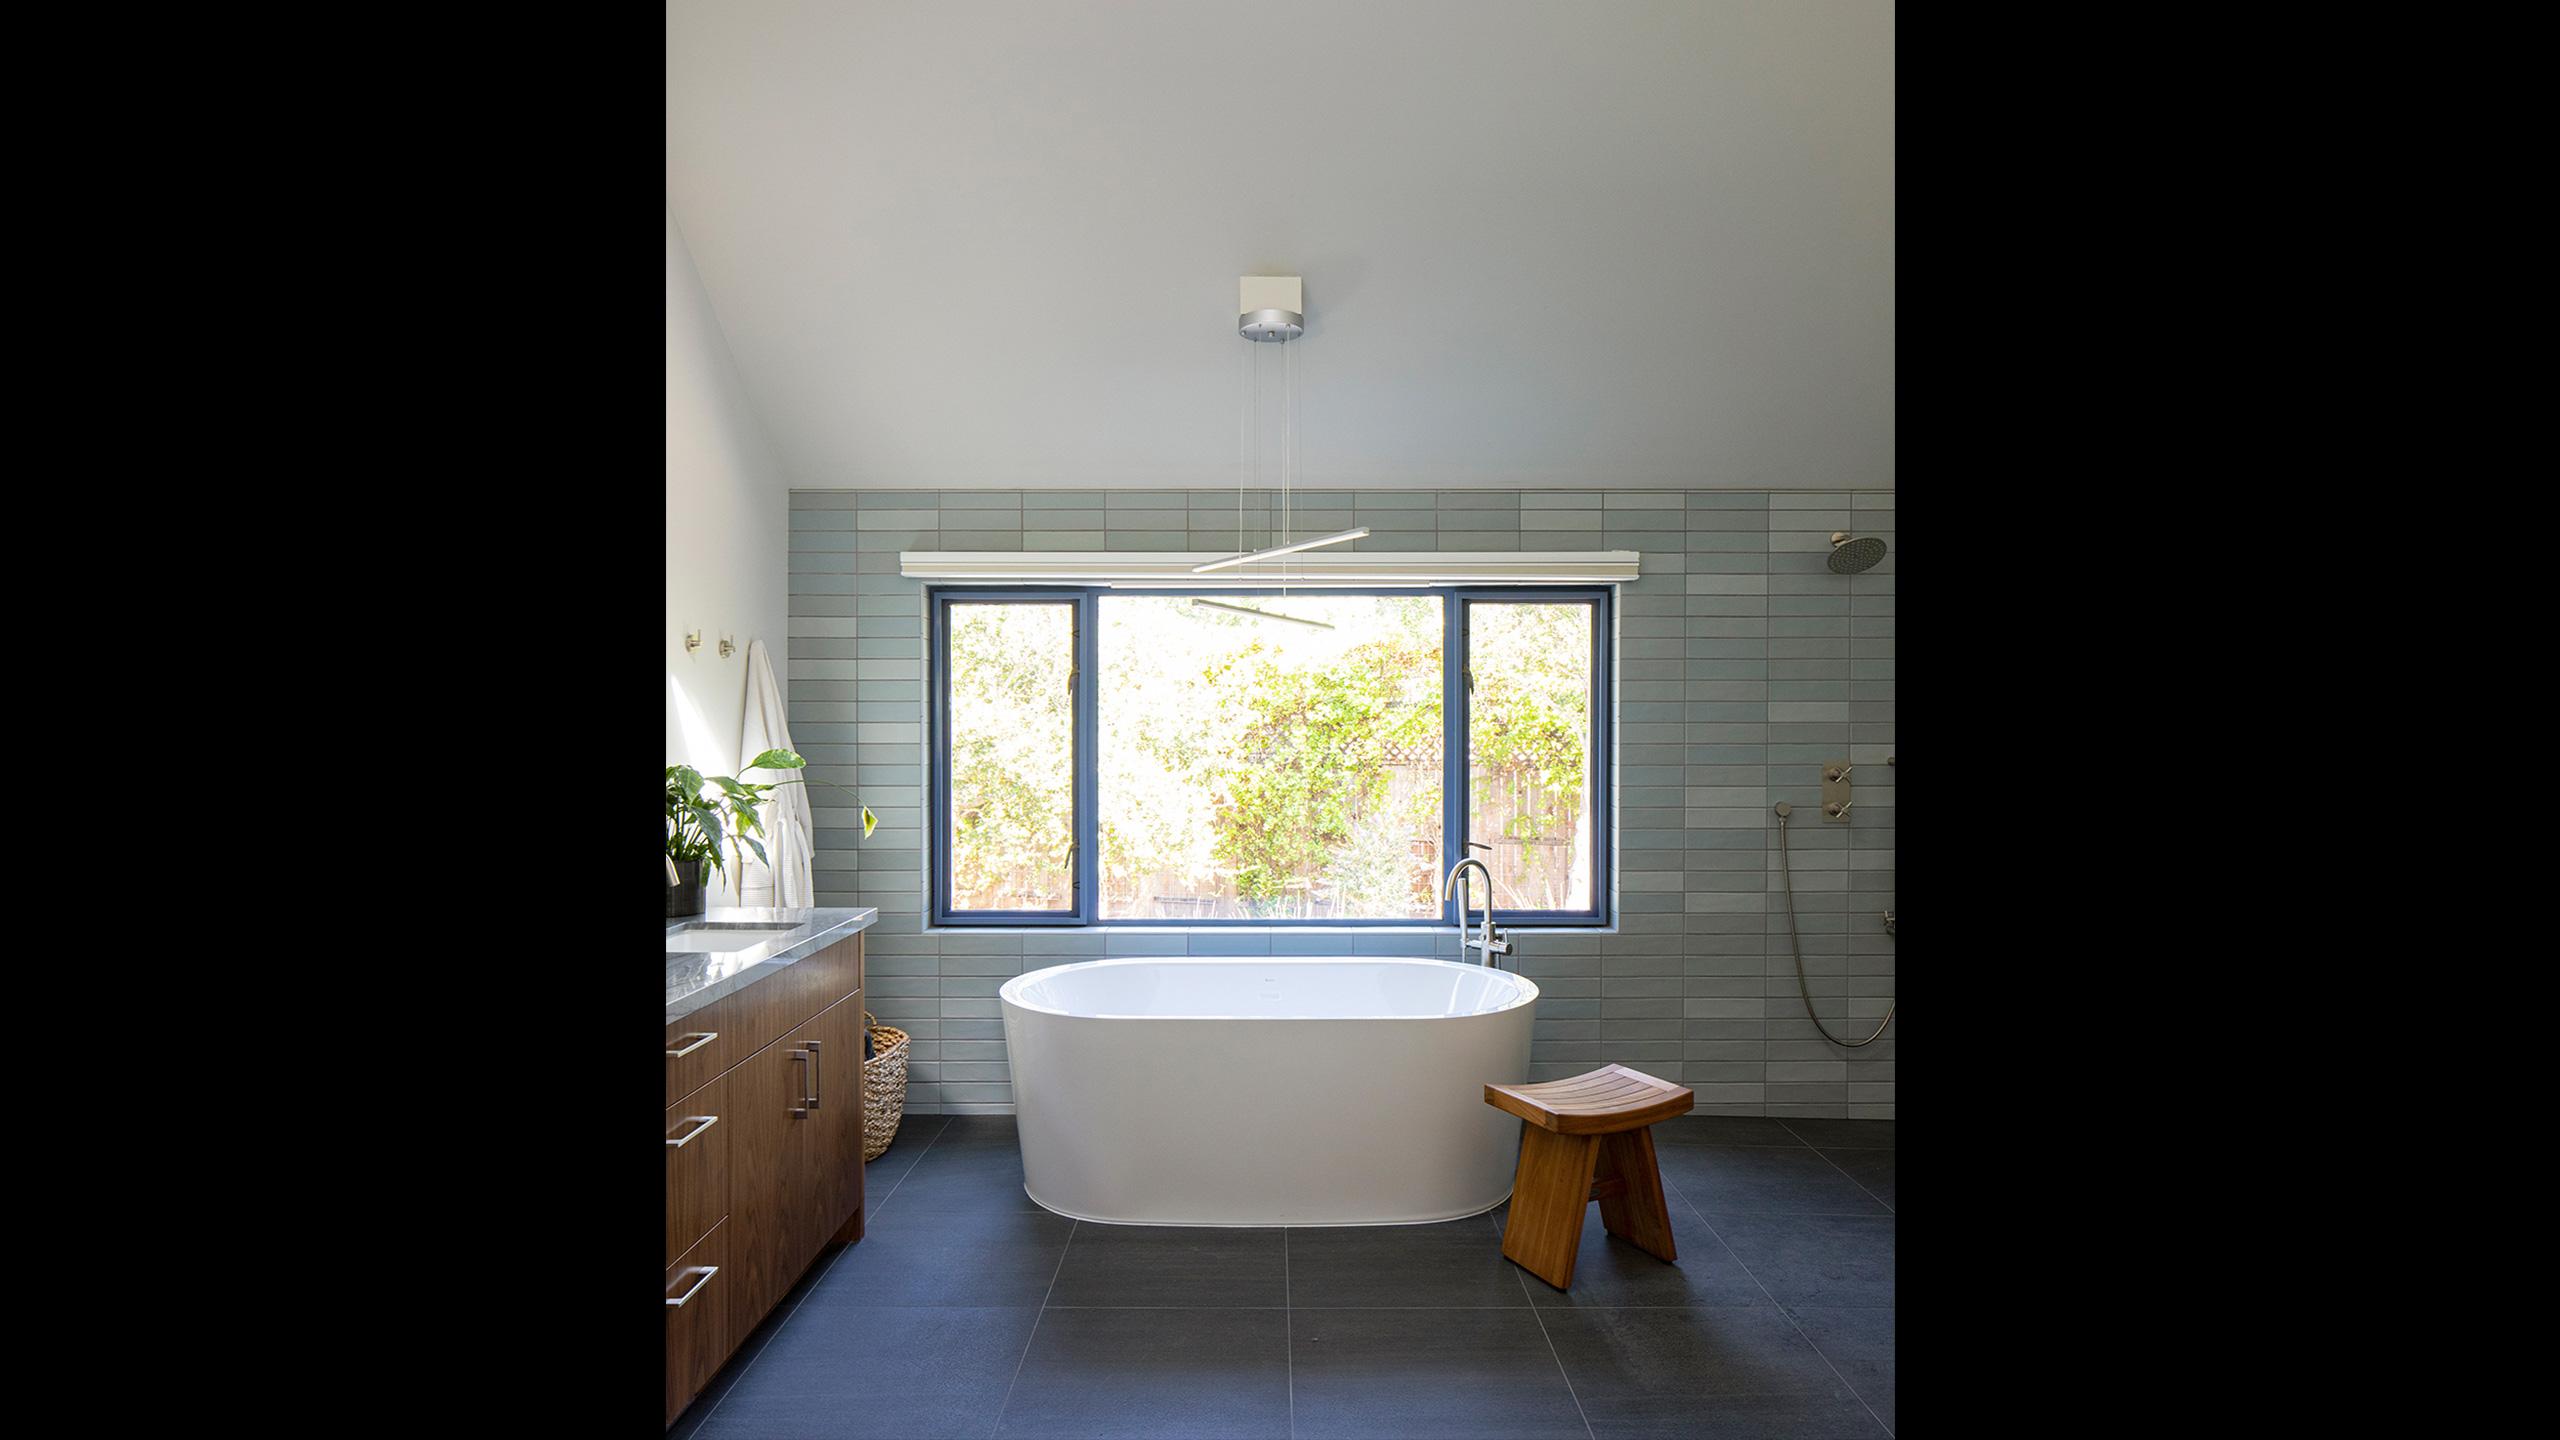 Napa-Farmhouse-bathroom-with-freestanding-tub